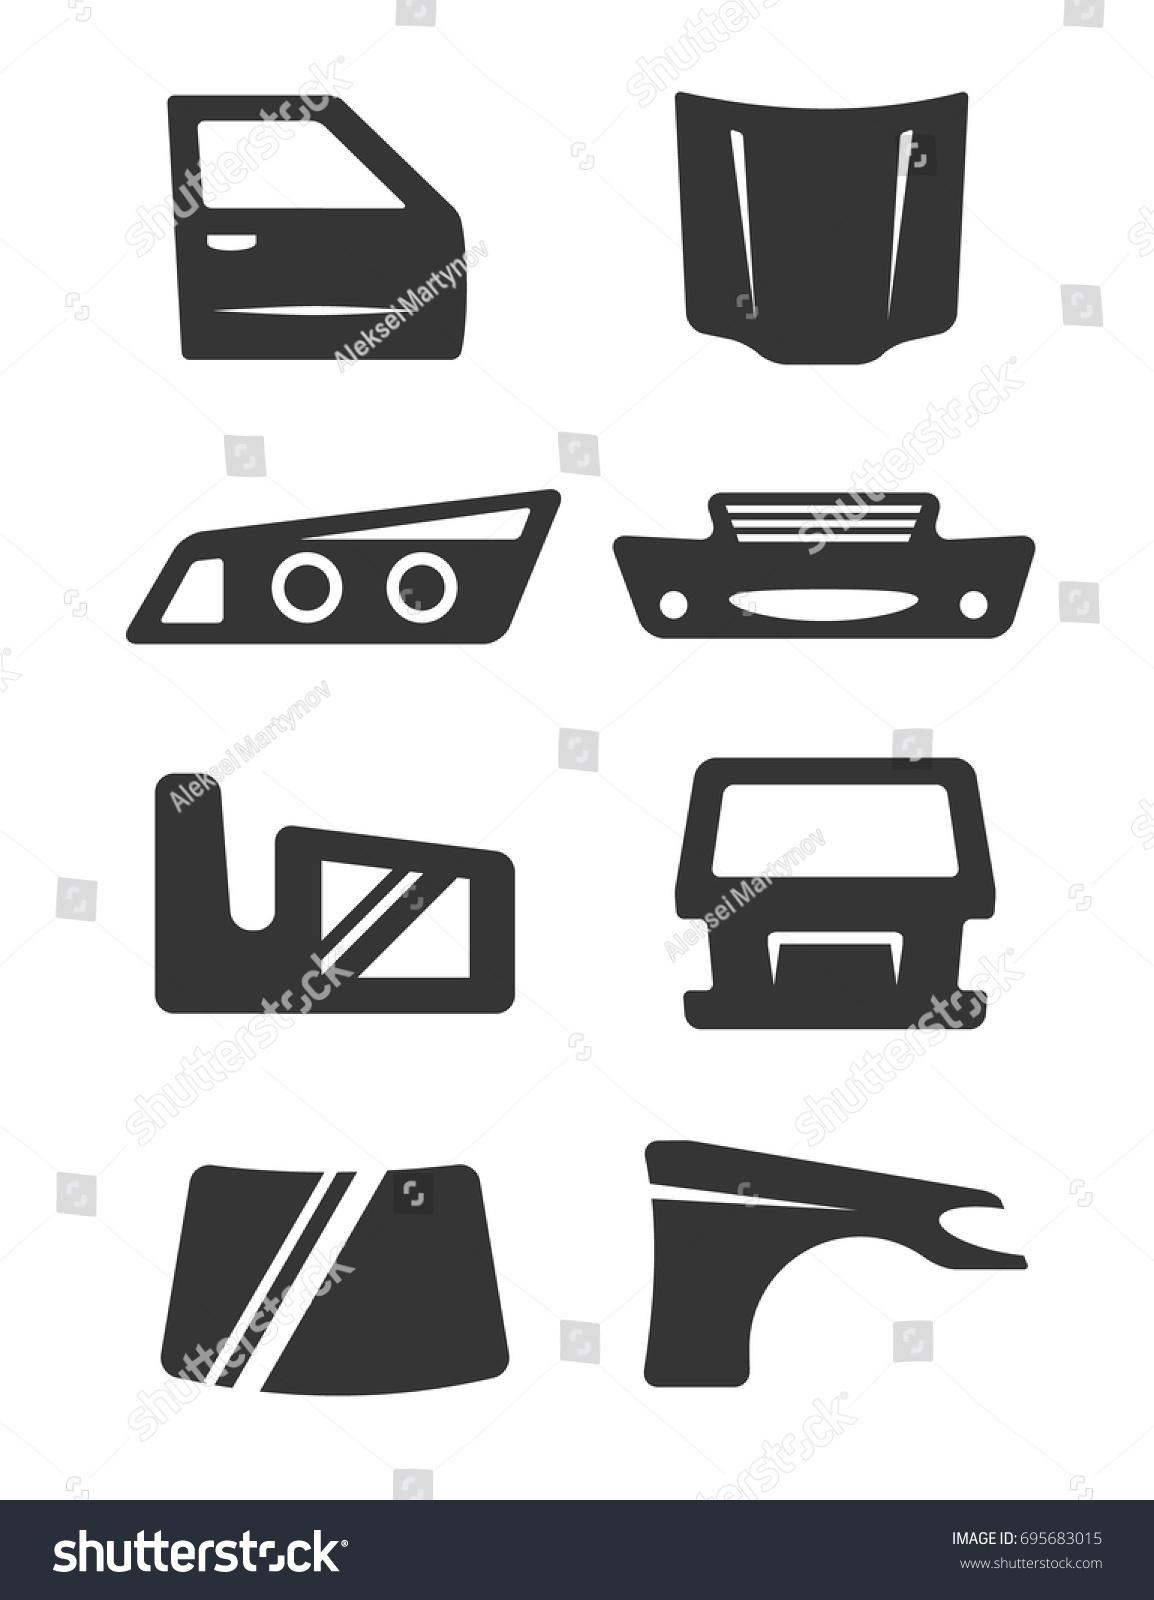 Set Eight Grey Icons Car Body Stock Vector 695683015 - Shutterstock